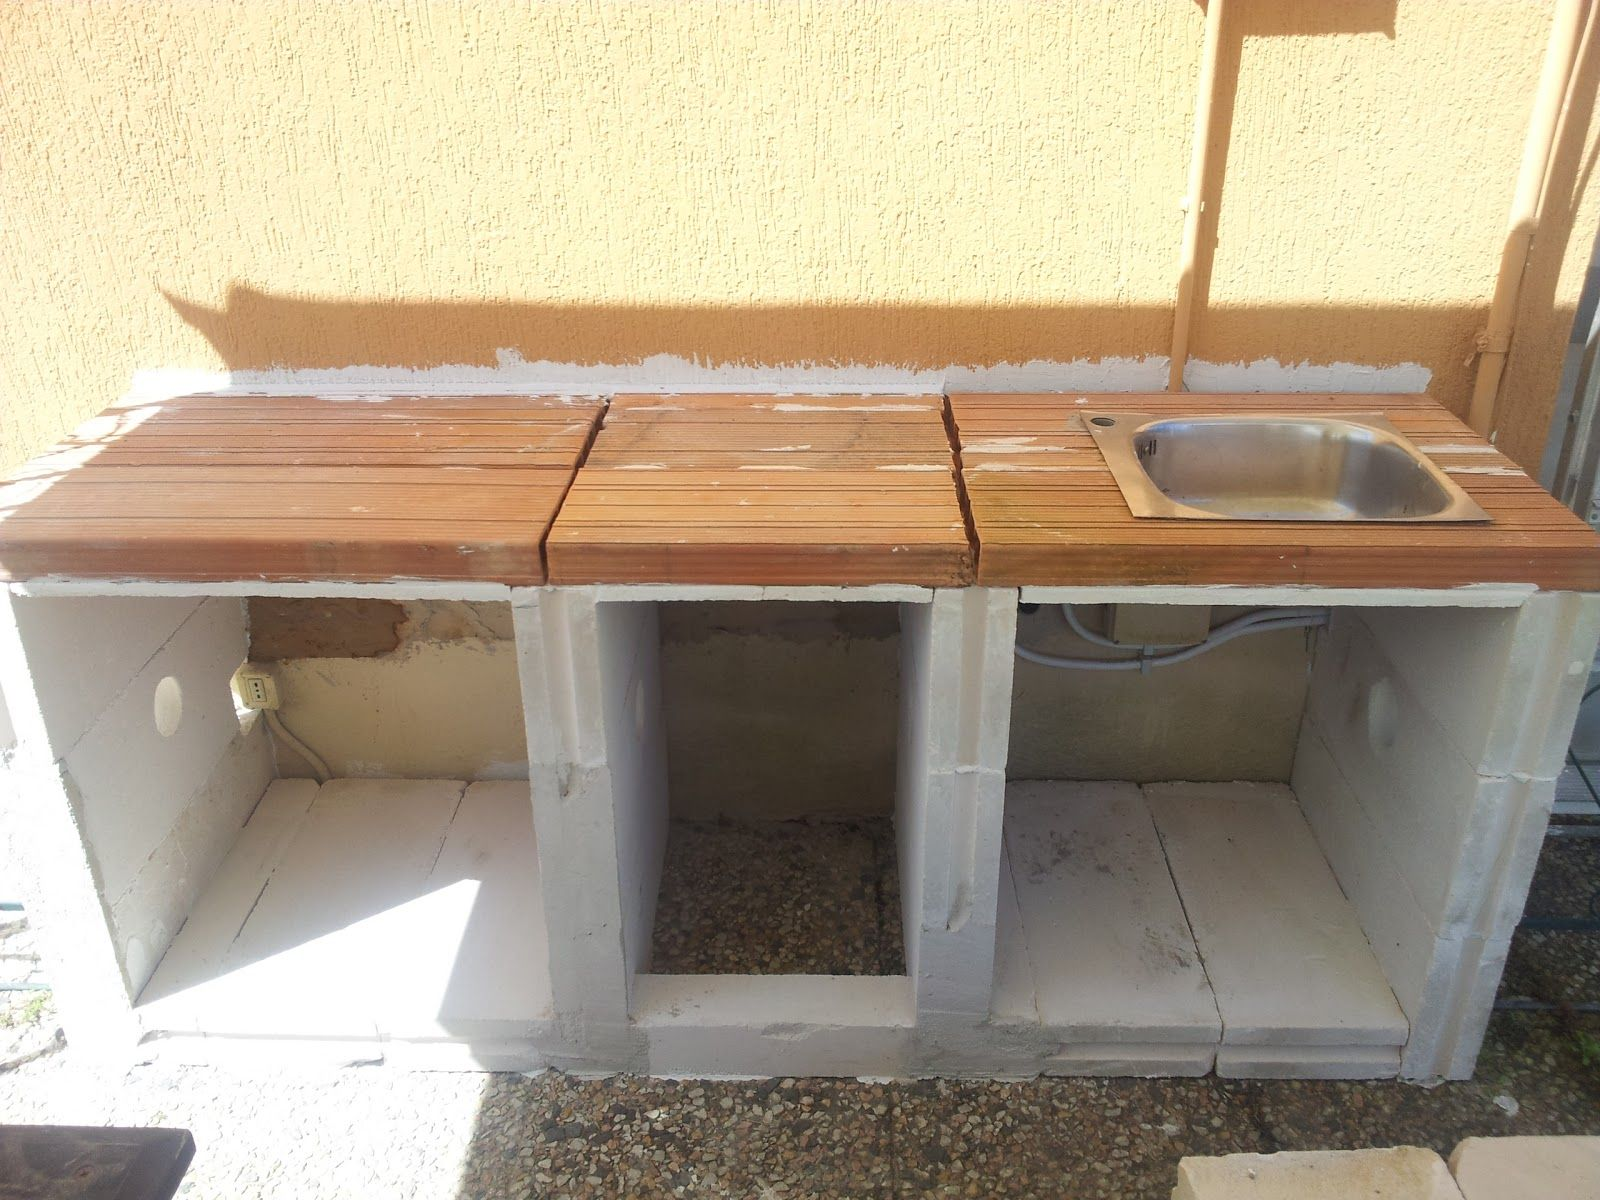 Cucine esterne da giardino in muratura barbecue da - Cucine da esterno in muratura ...